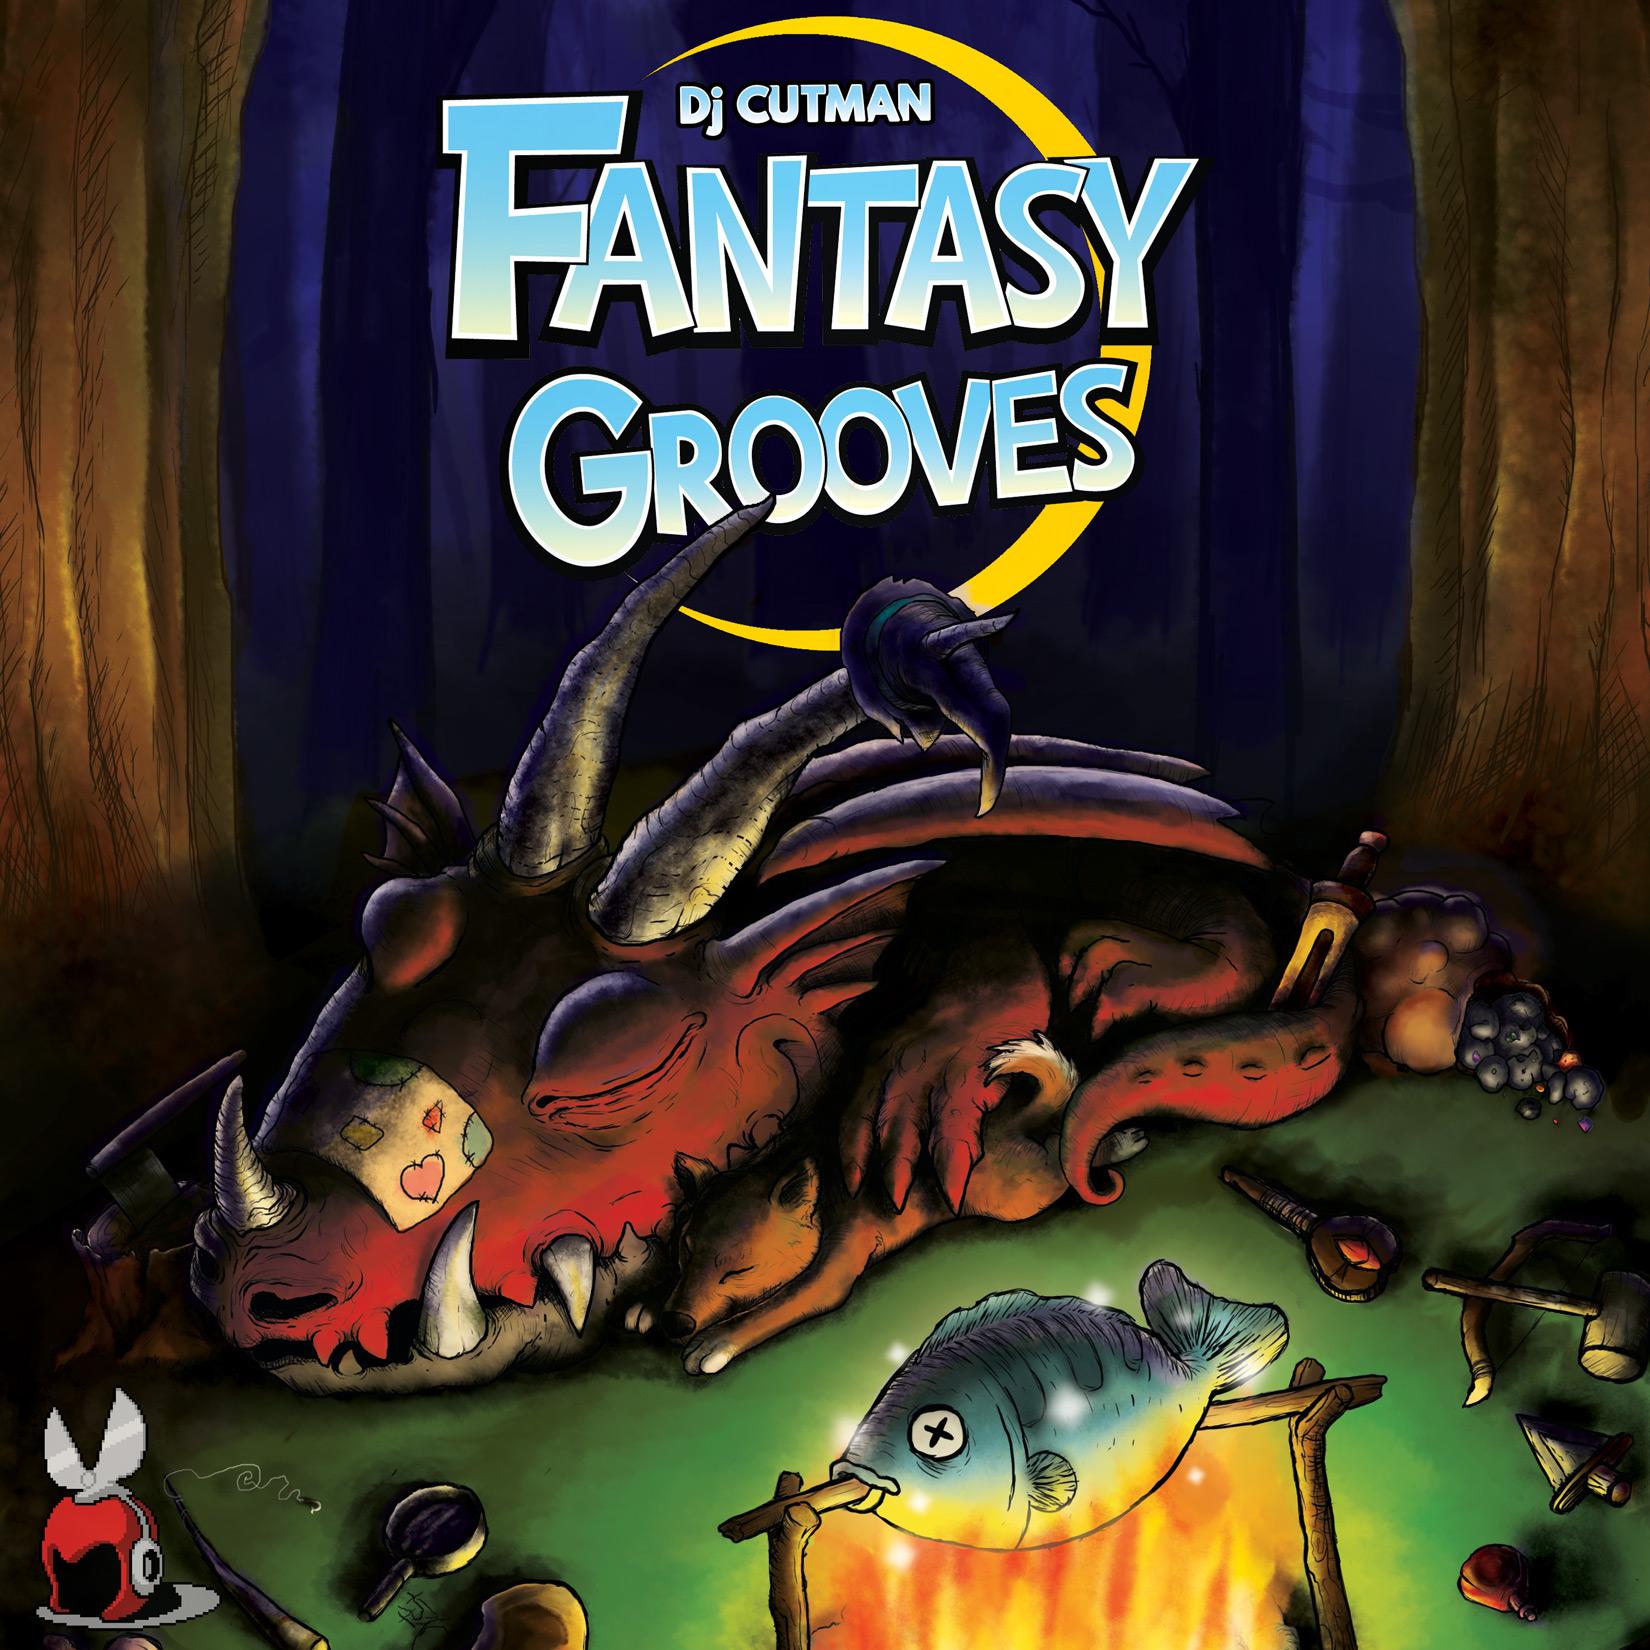 Fantasy Grooves – Dj CUTMAN